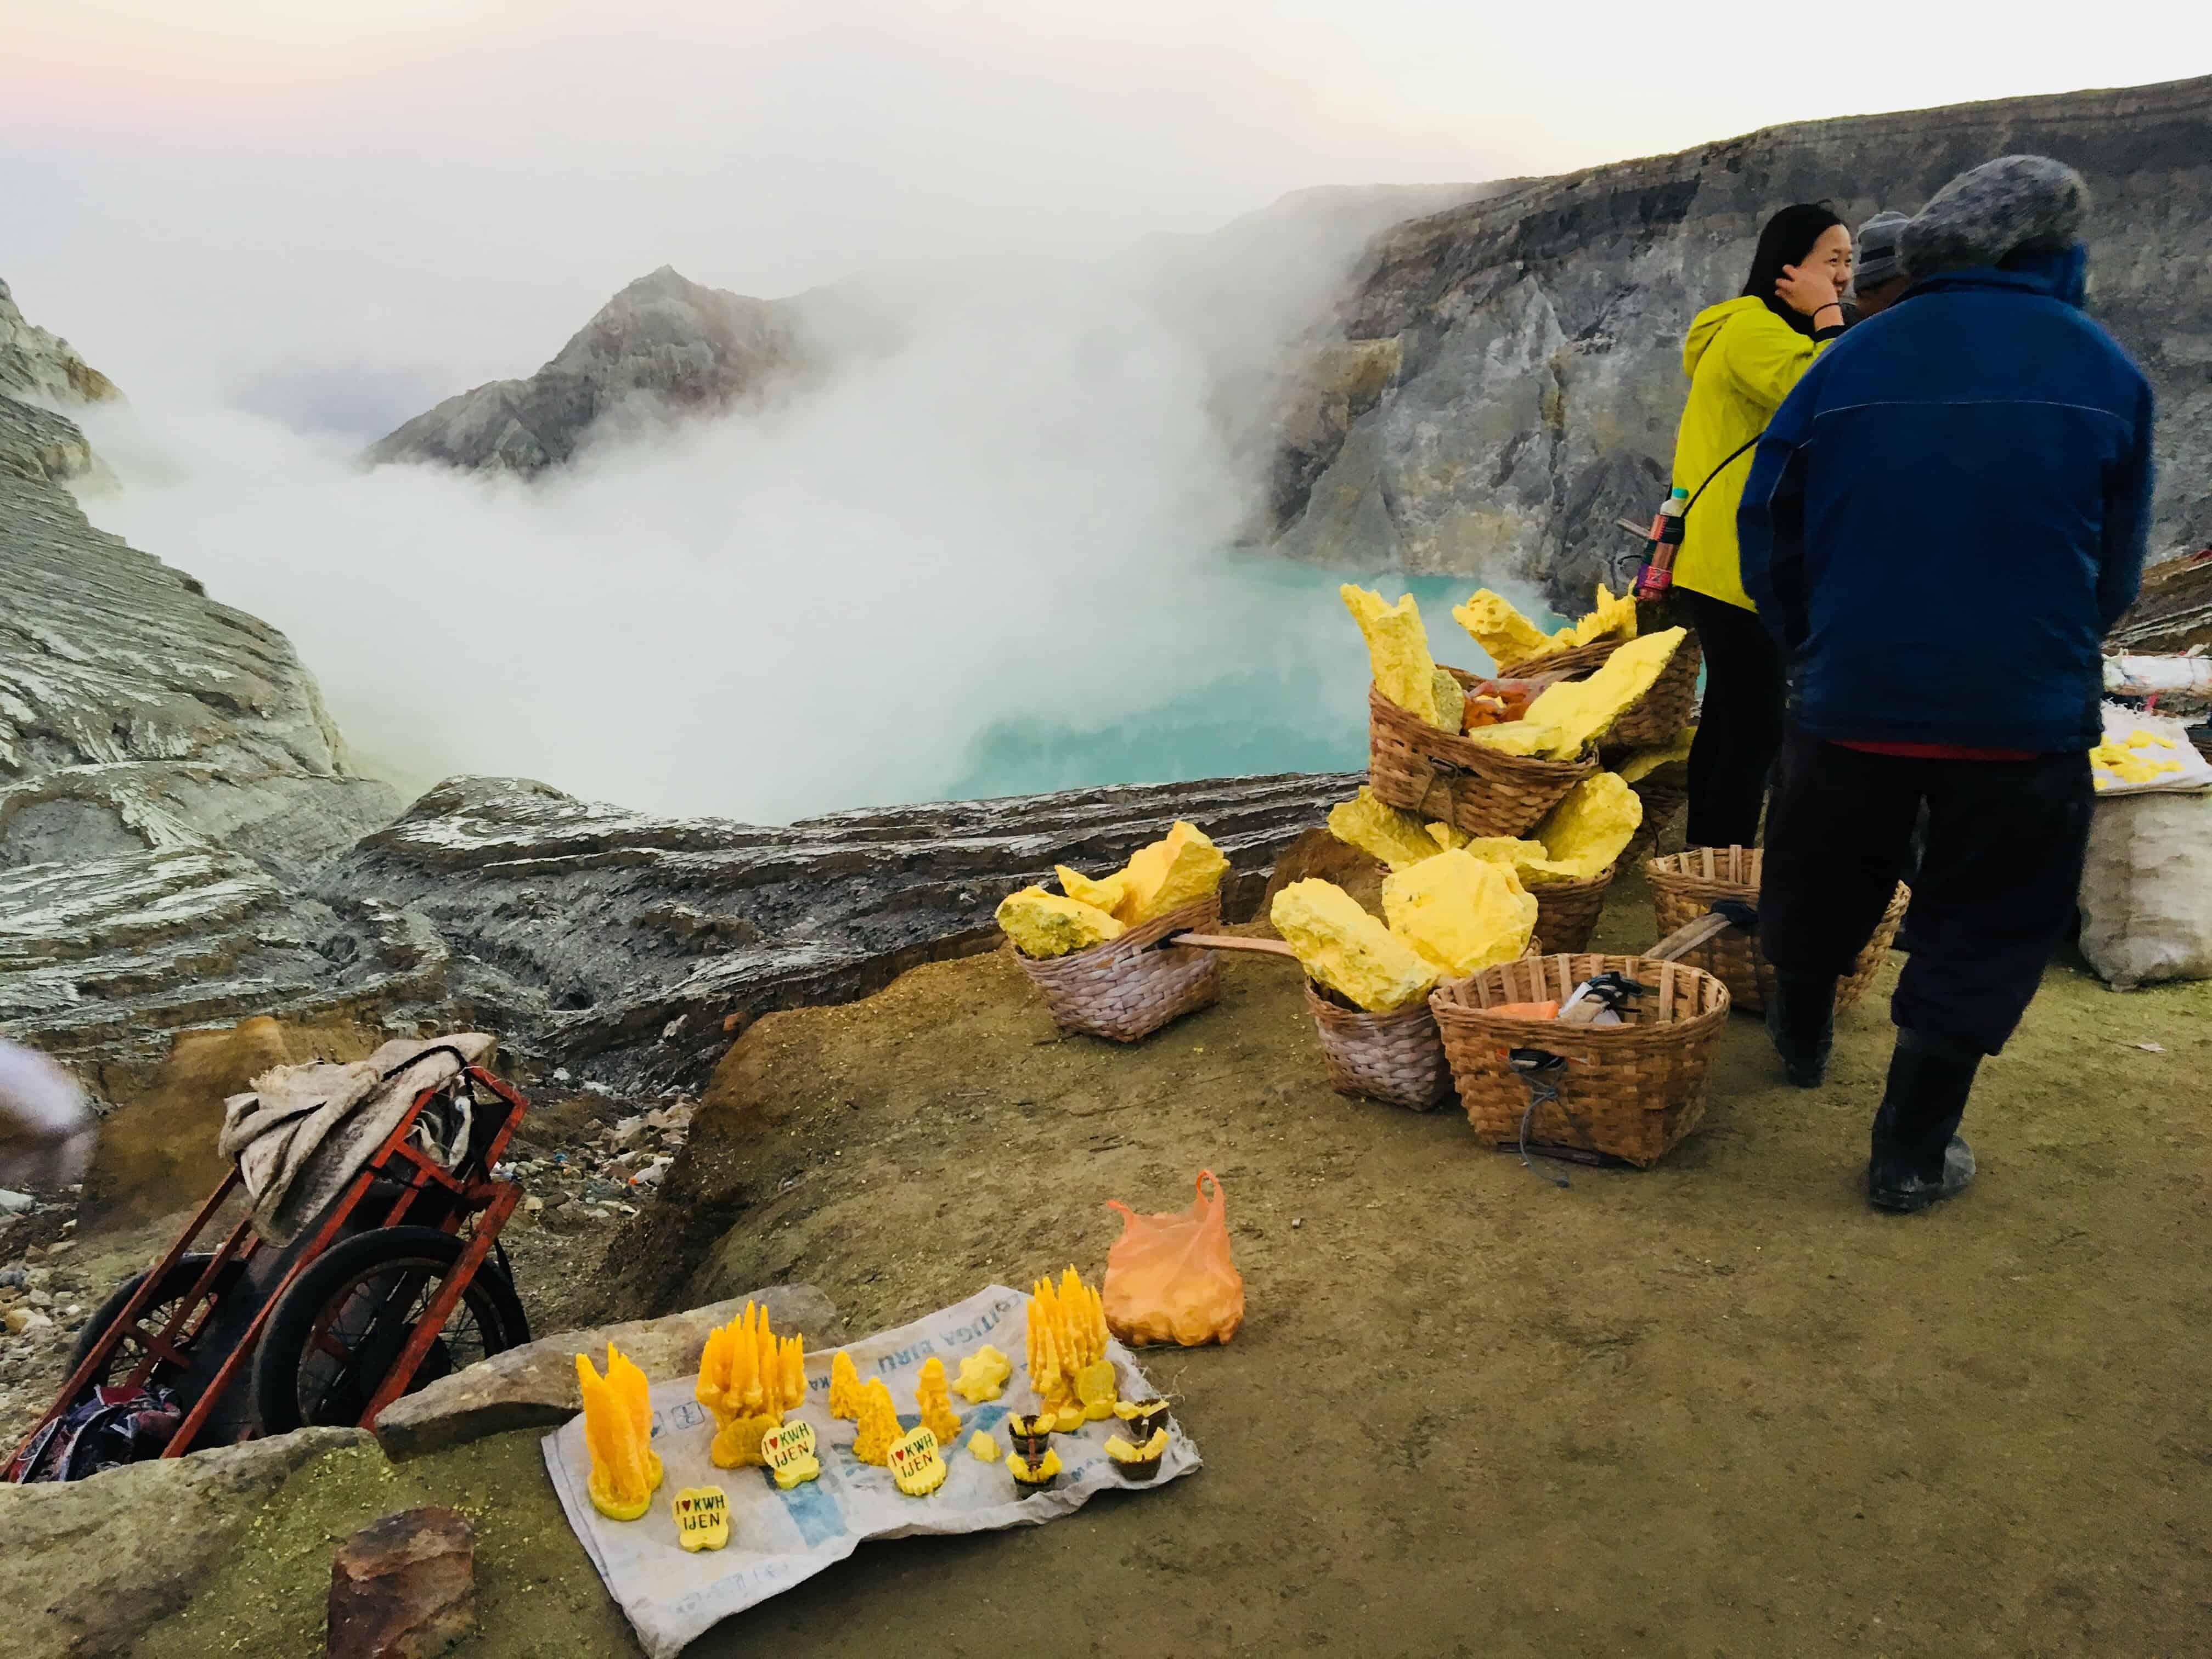 Vulcano Ijen, lago acido, miniera zolfo